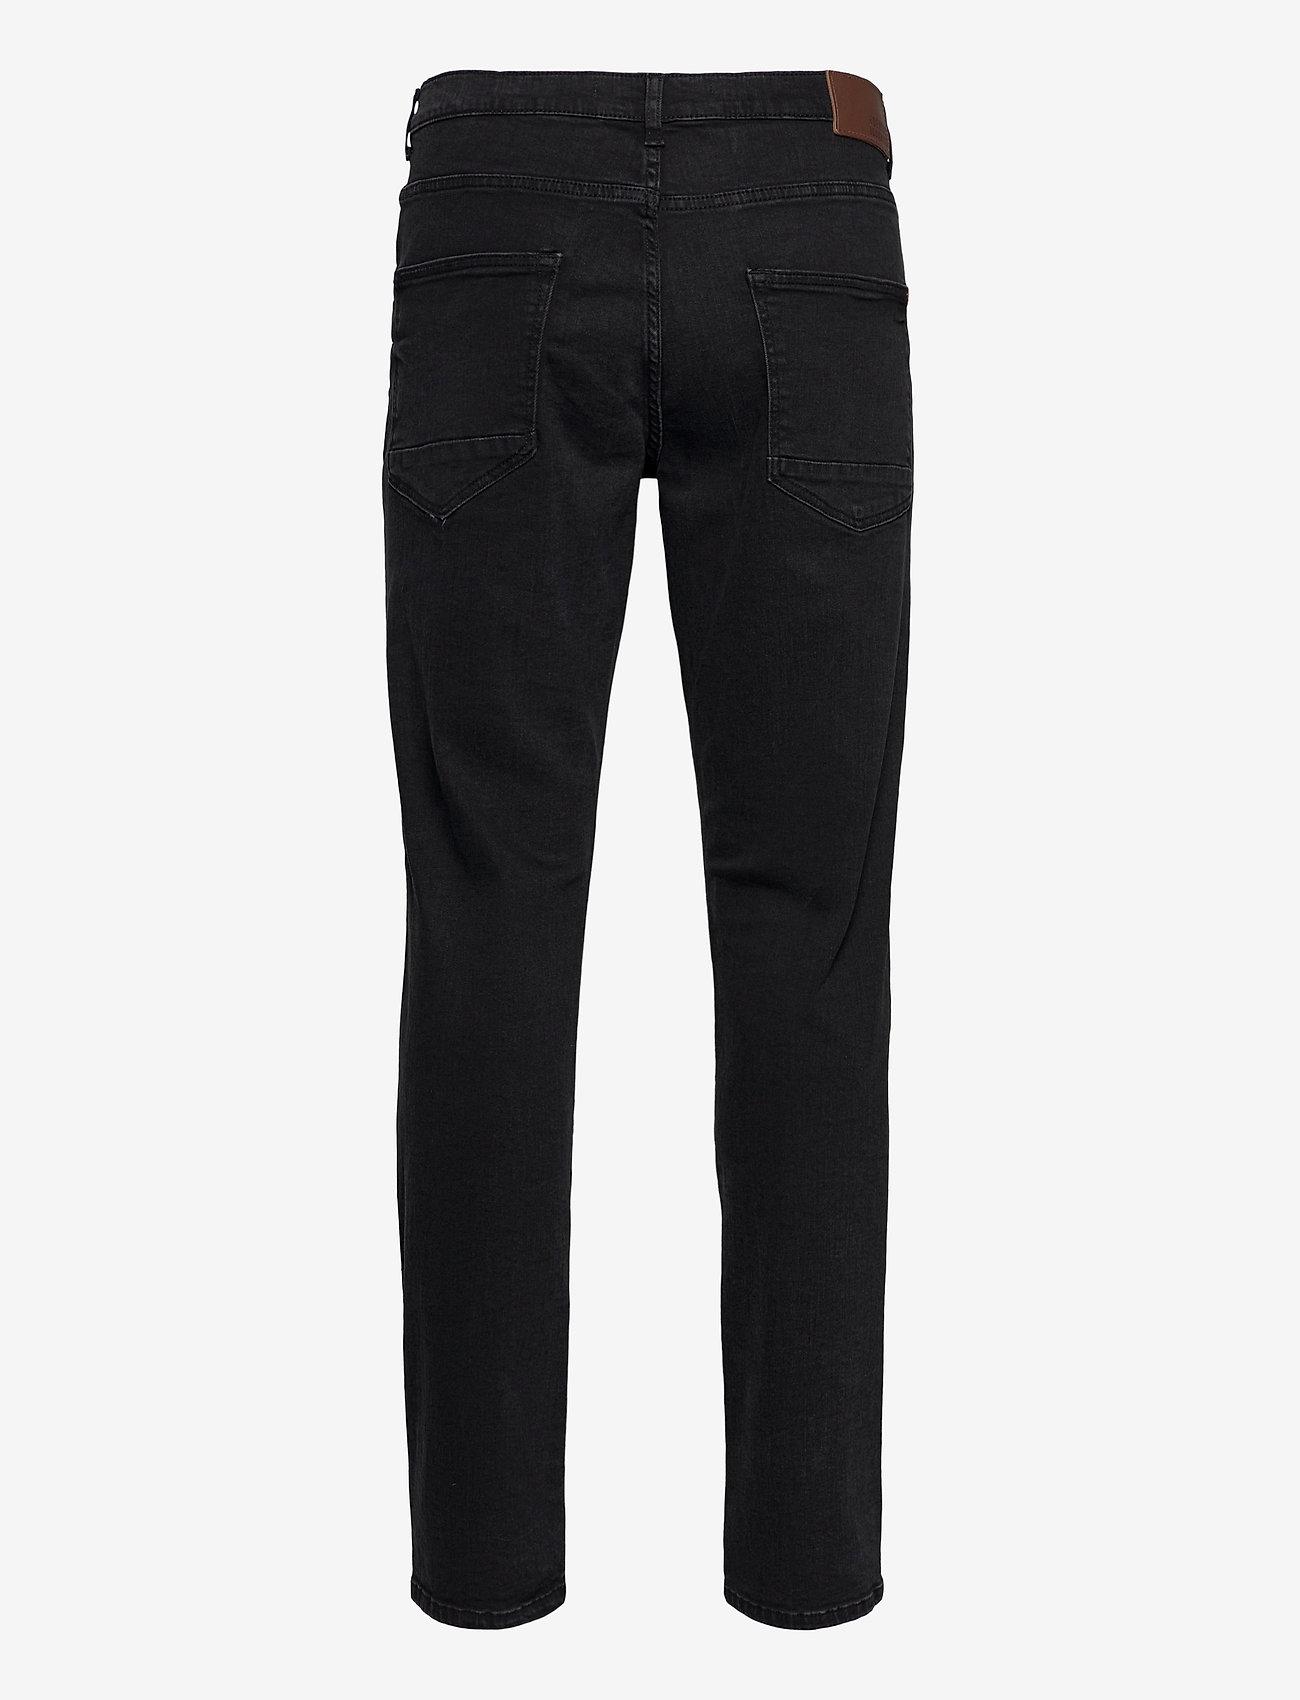 Solid 6206720 SDRyder - Jeans BLACK - Menn Klær